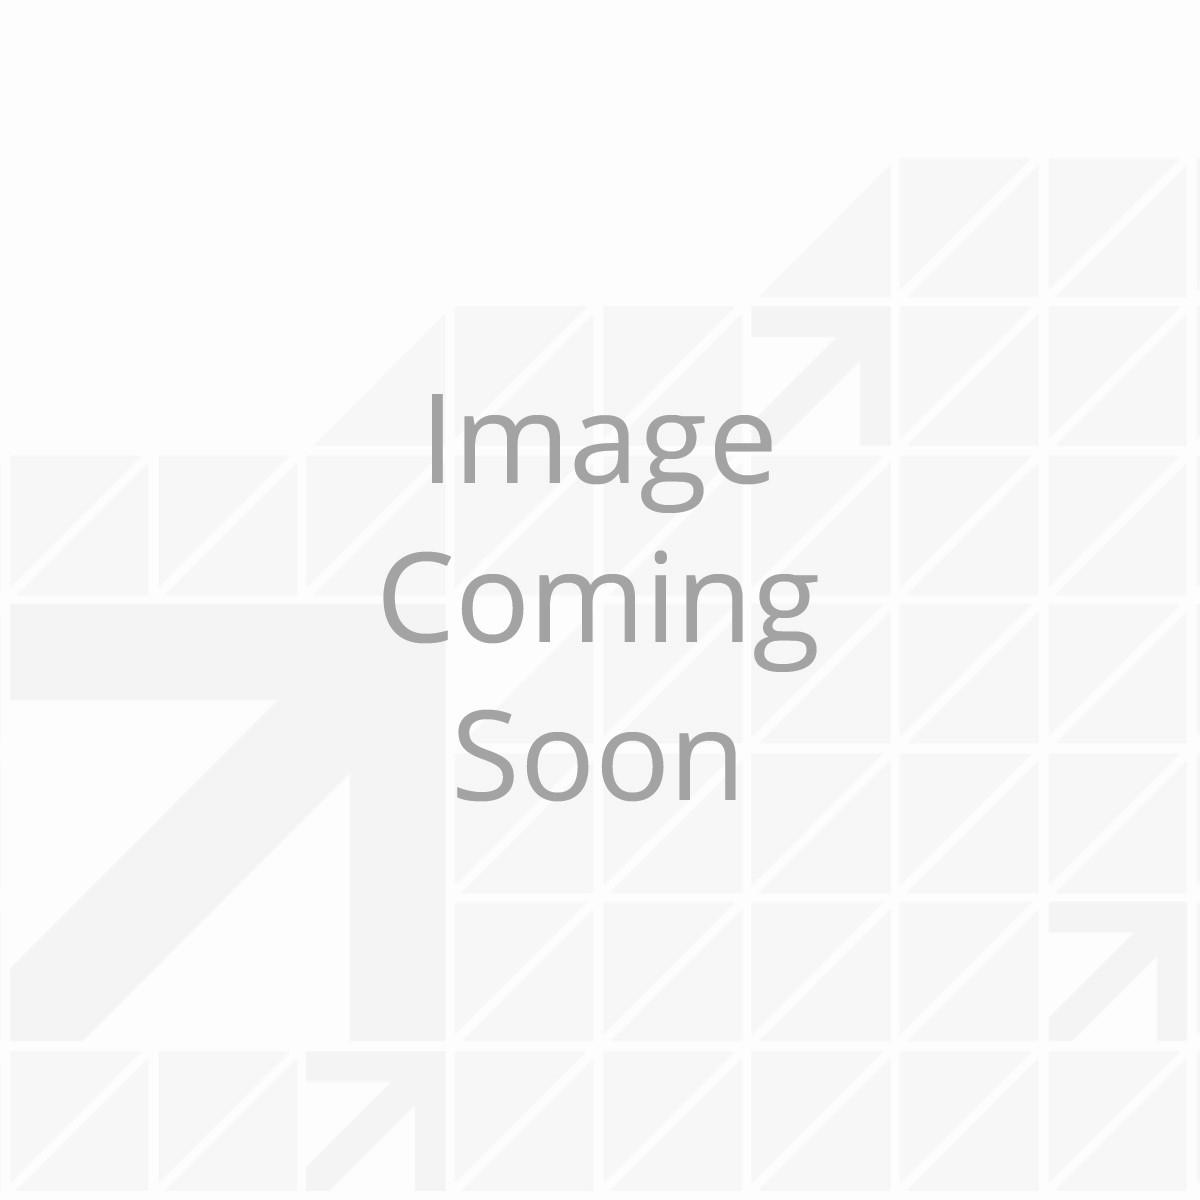 19' Power & Hybrid Awning Roller Assembly - Prepflex Solid Black